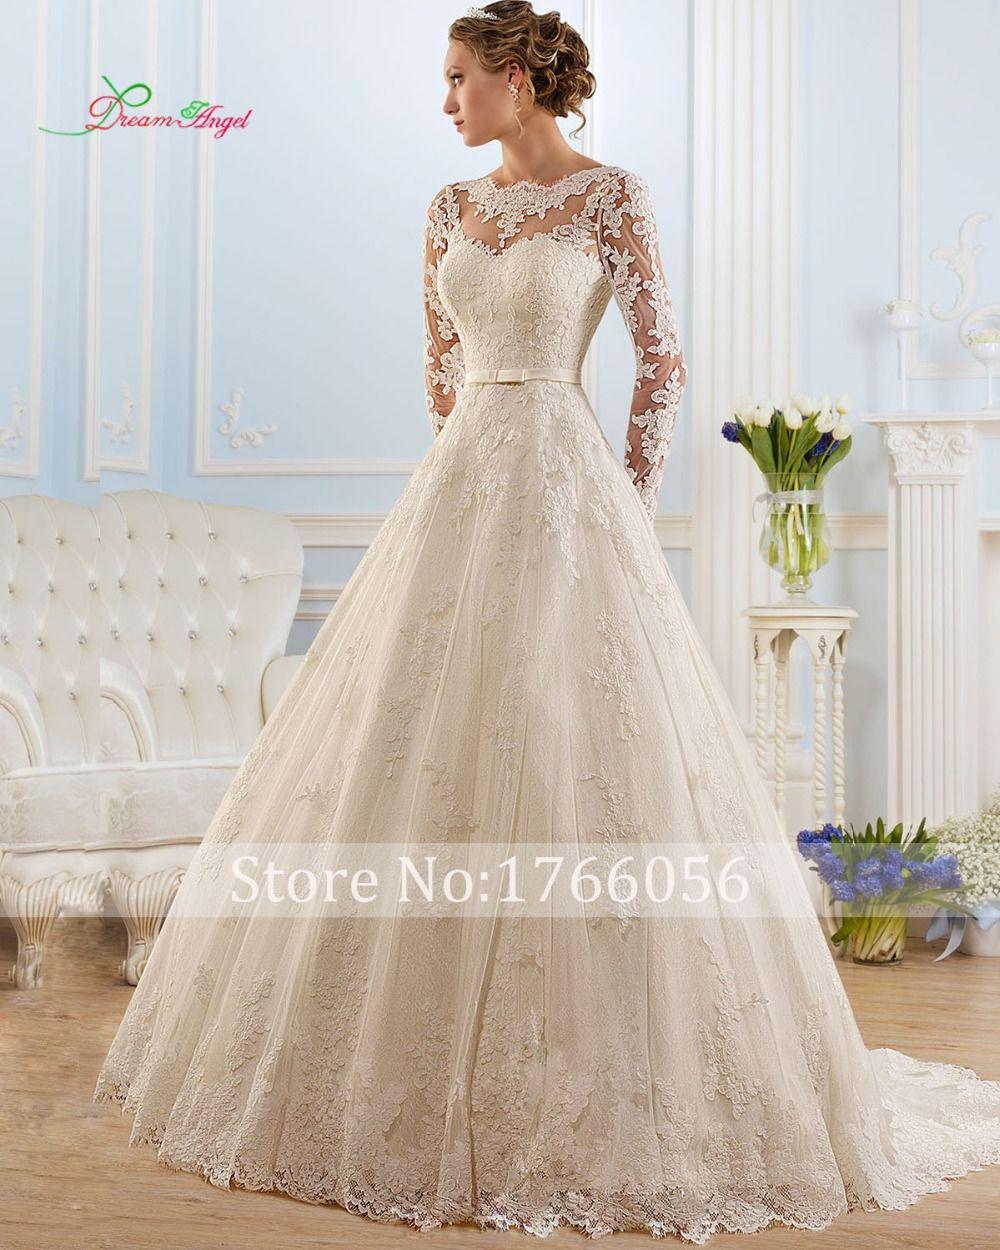 Vestido de noiva fashion wedding gowns elegant bride dress vintage